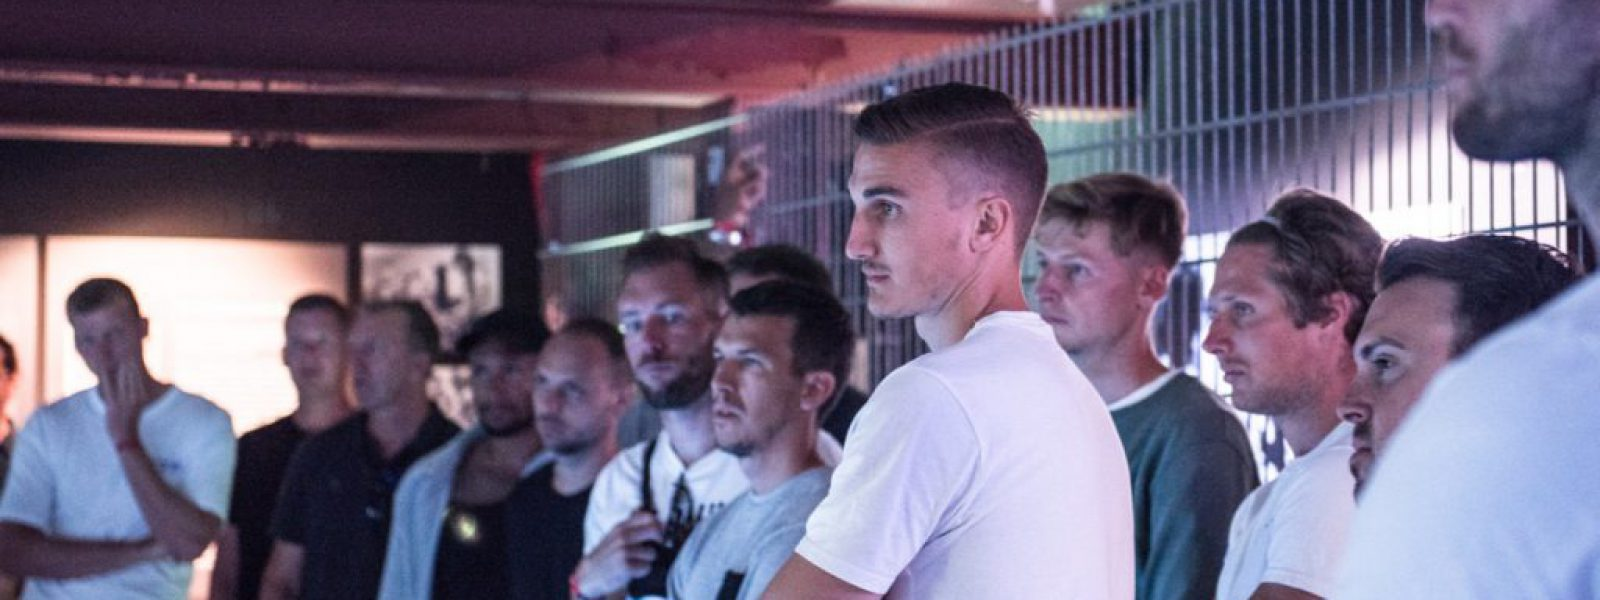 2019_0623 FC St Pauli erste Mannschaft im KIEZBEBEN (Foto Sabrina Adeline Nagel) - 20